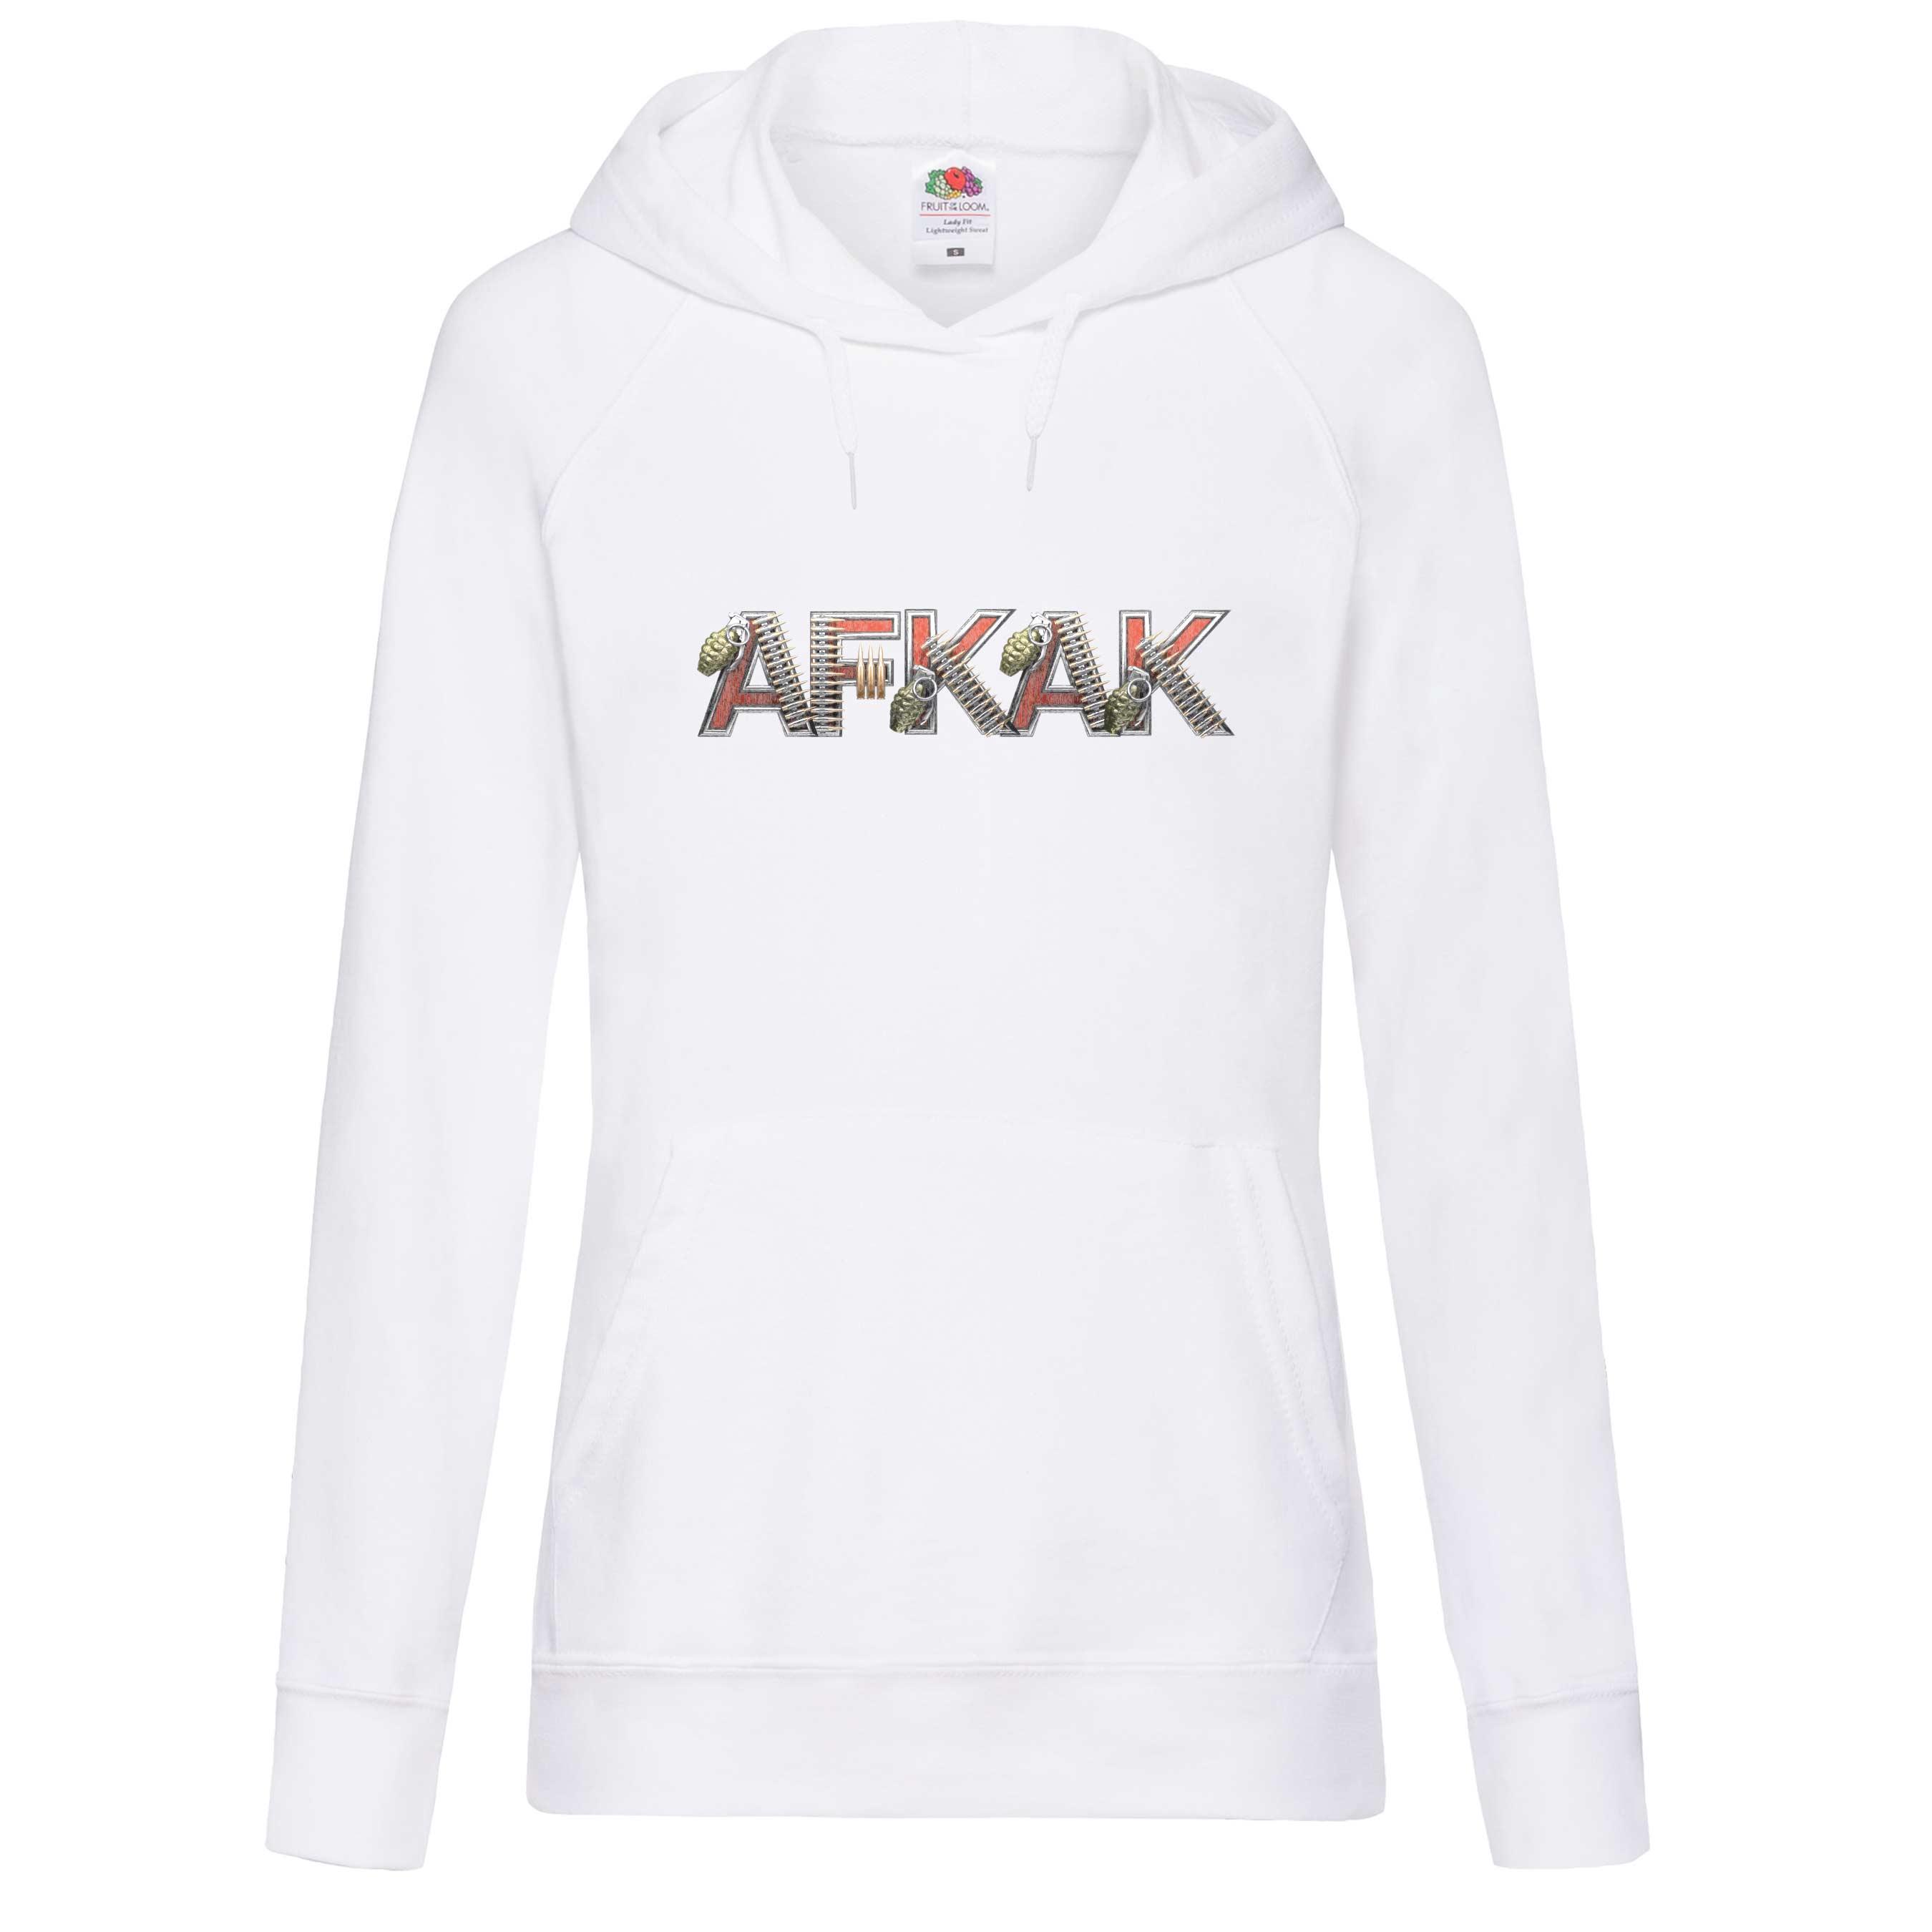 Afkak design for t-shirt, hoodie & sweatshirt